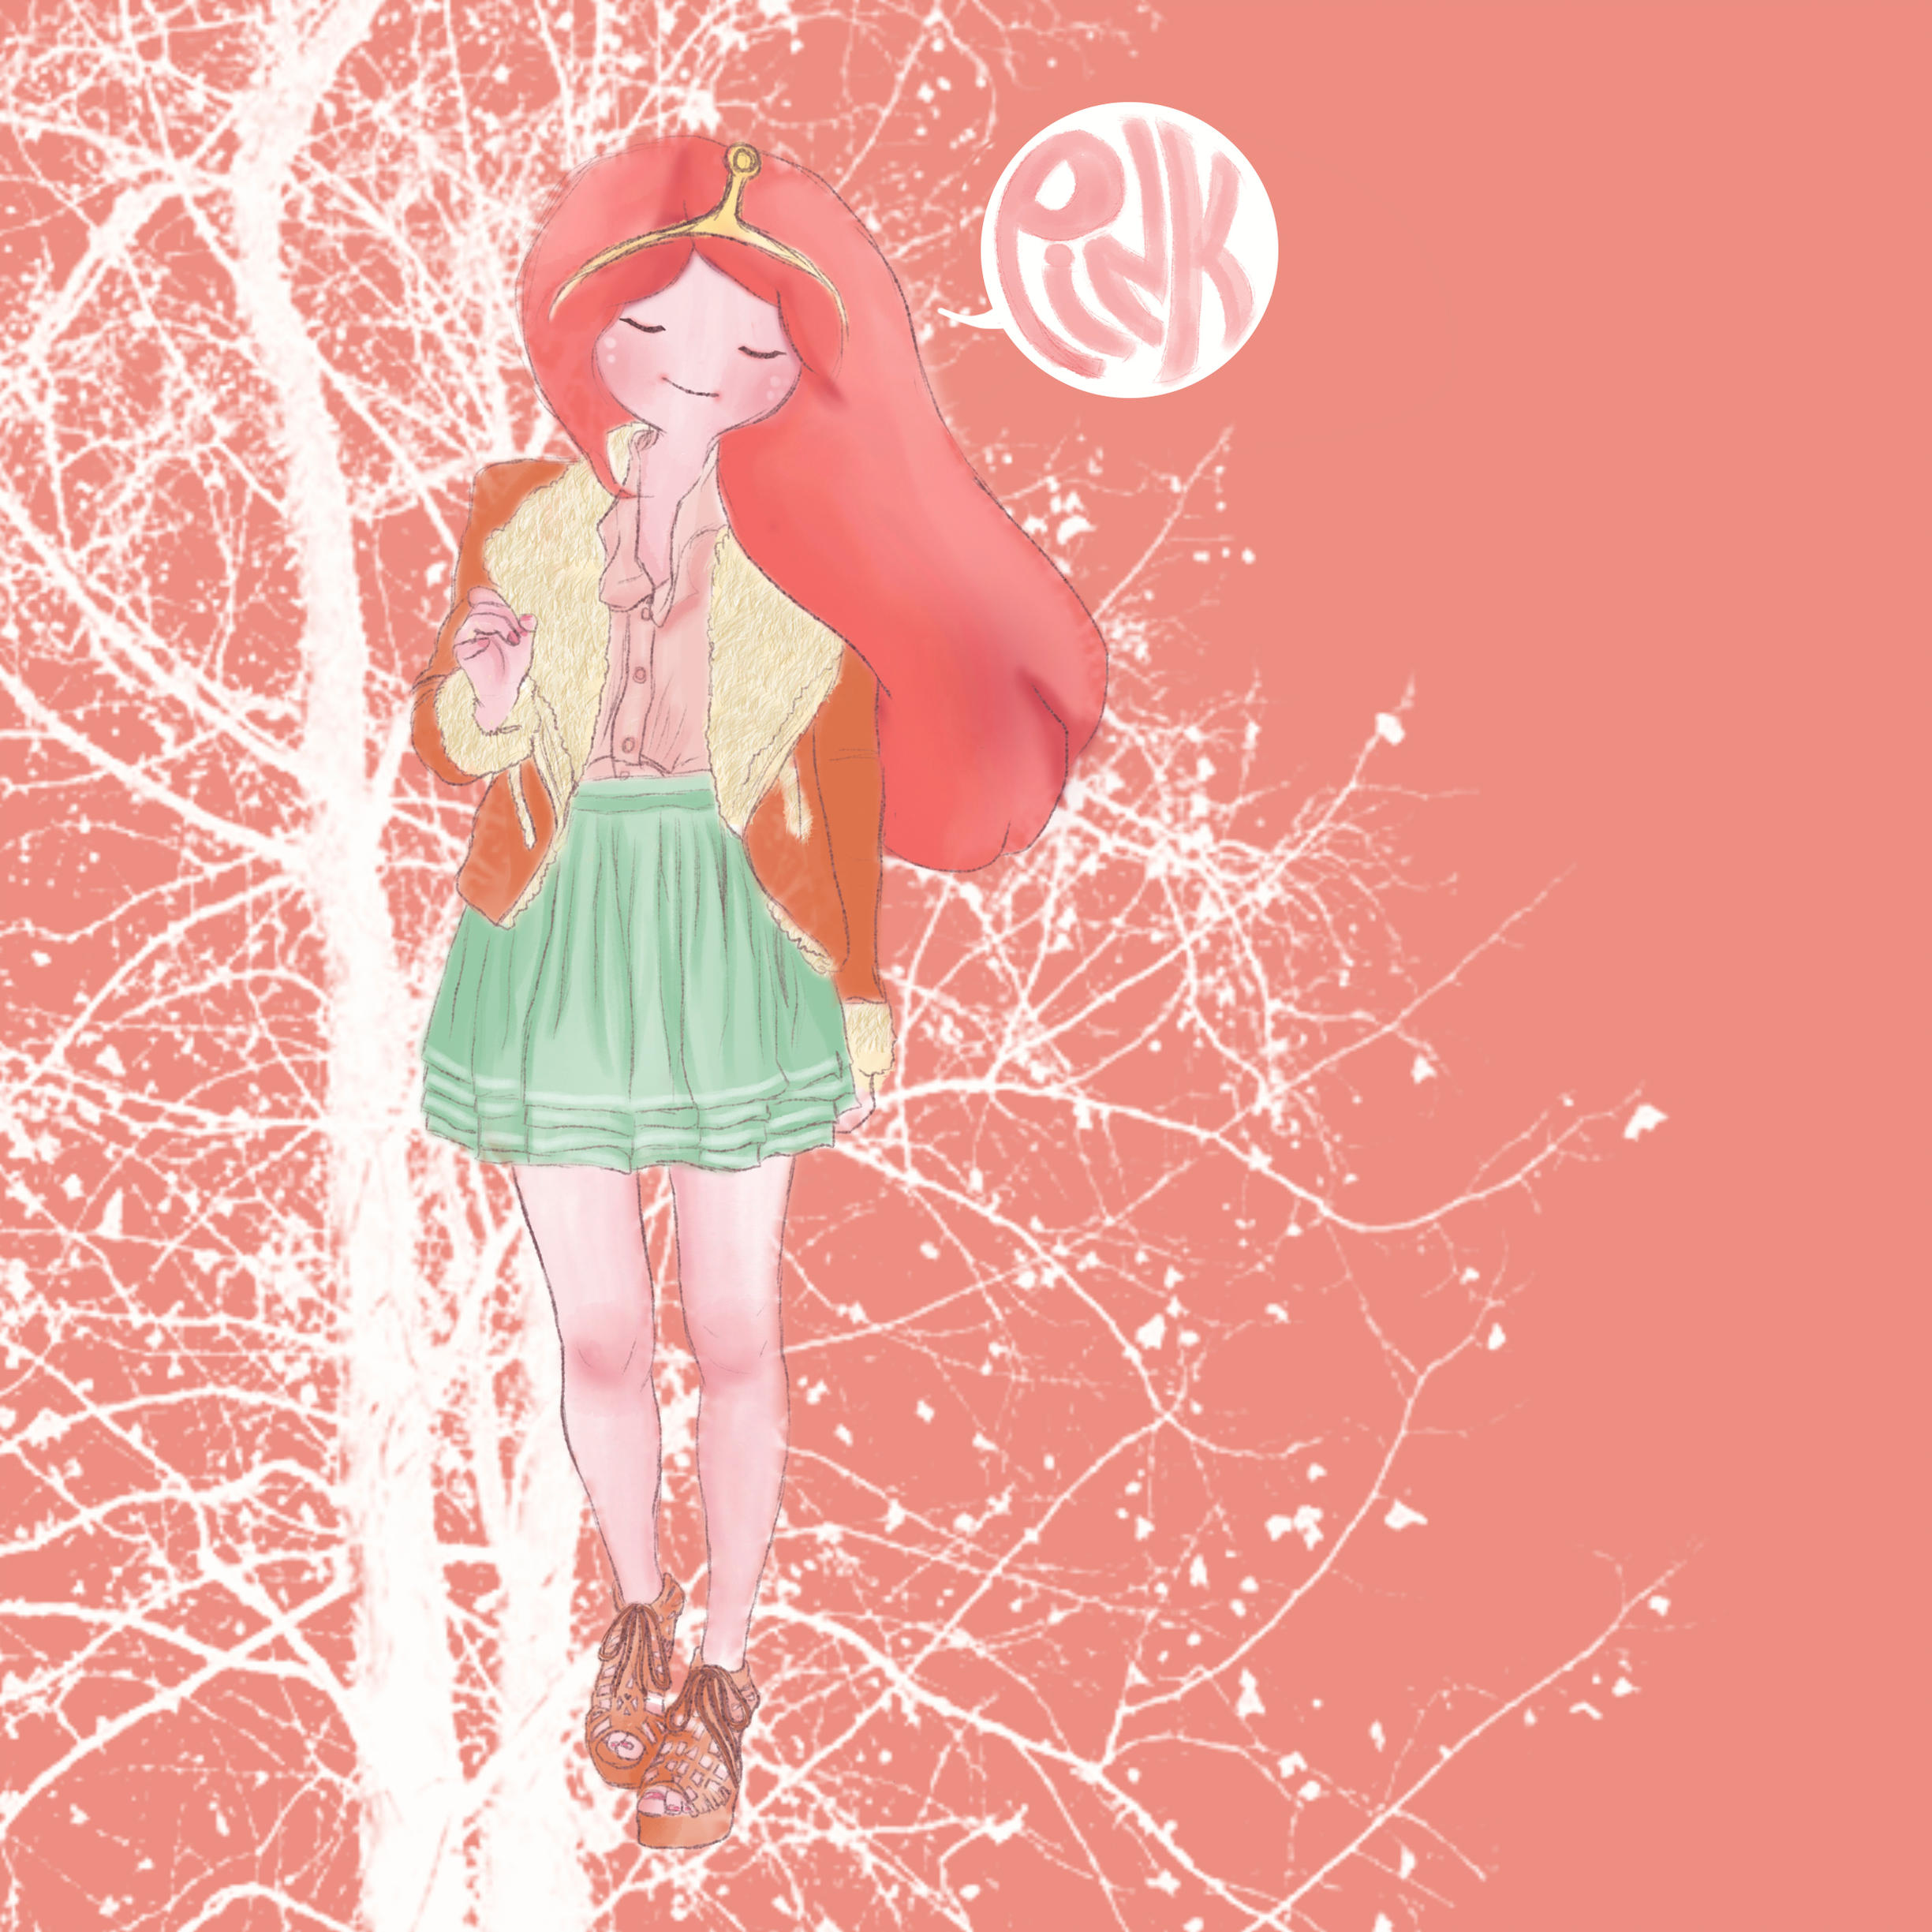 Princess Bubblegum by iwannakissallama